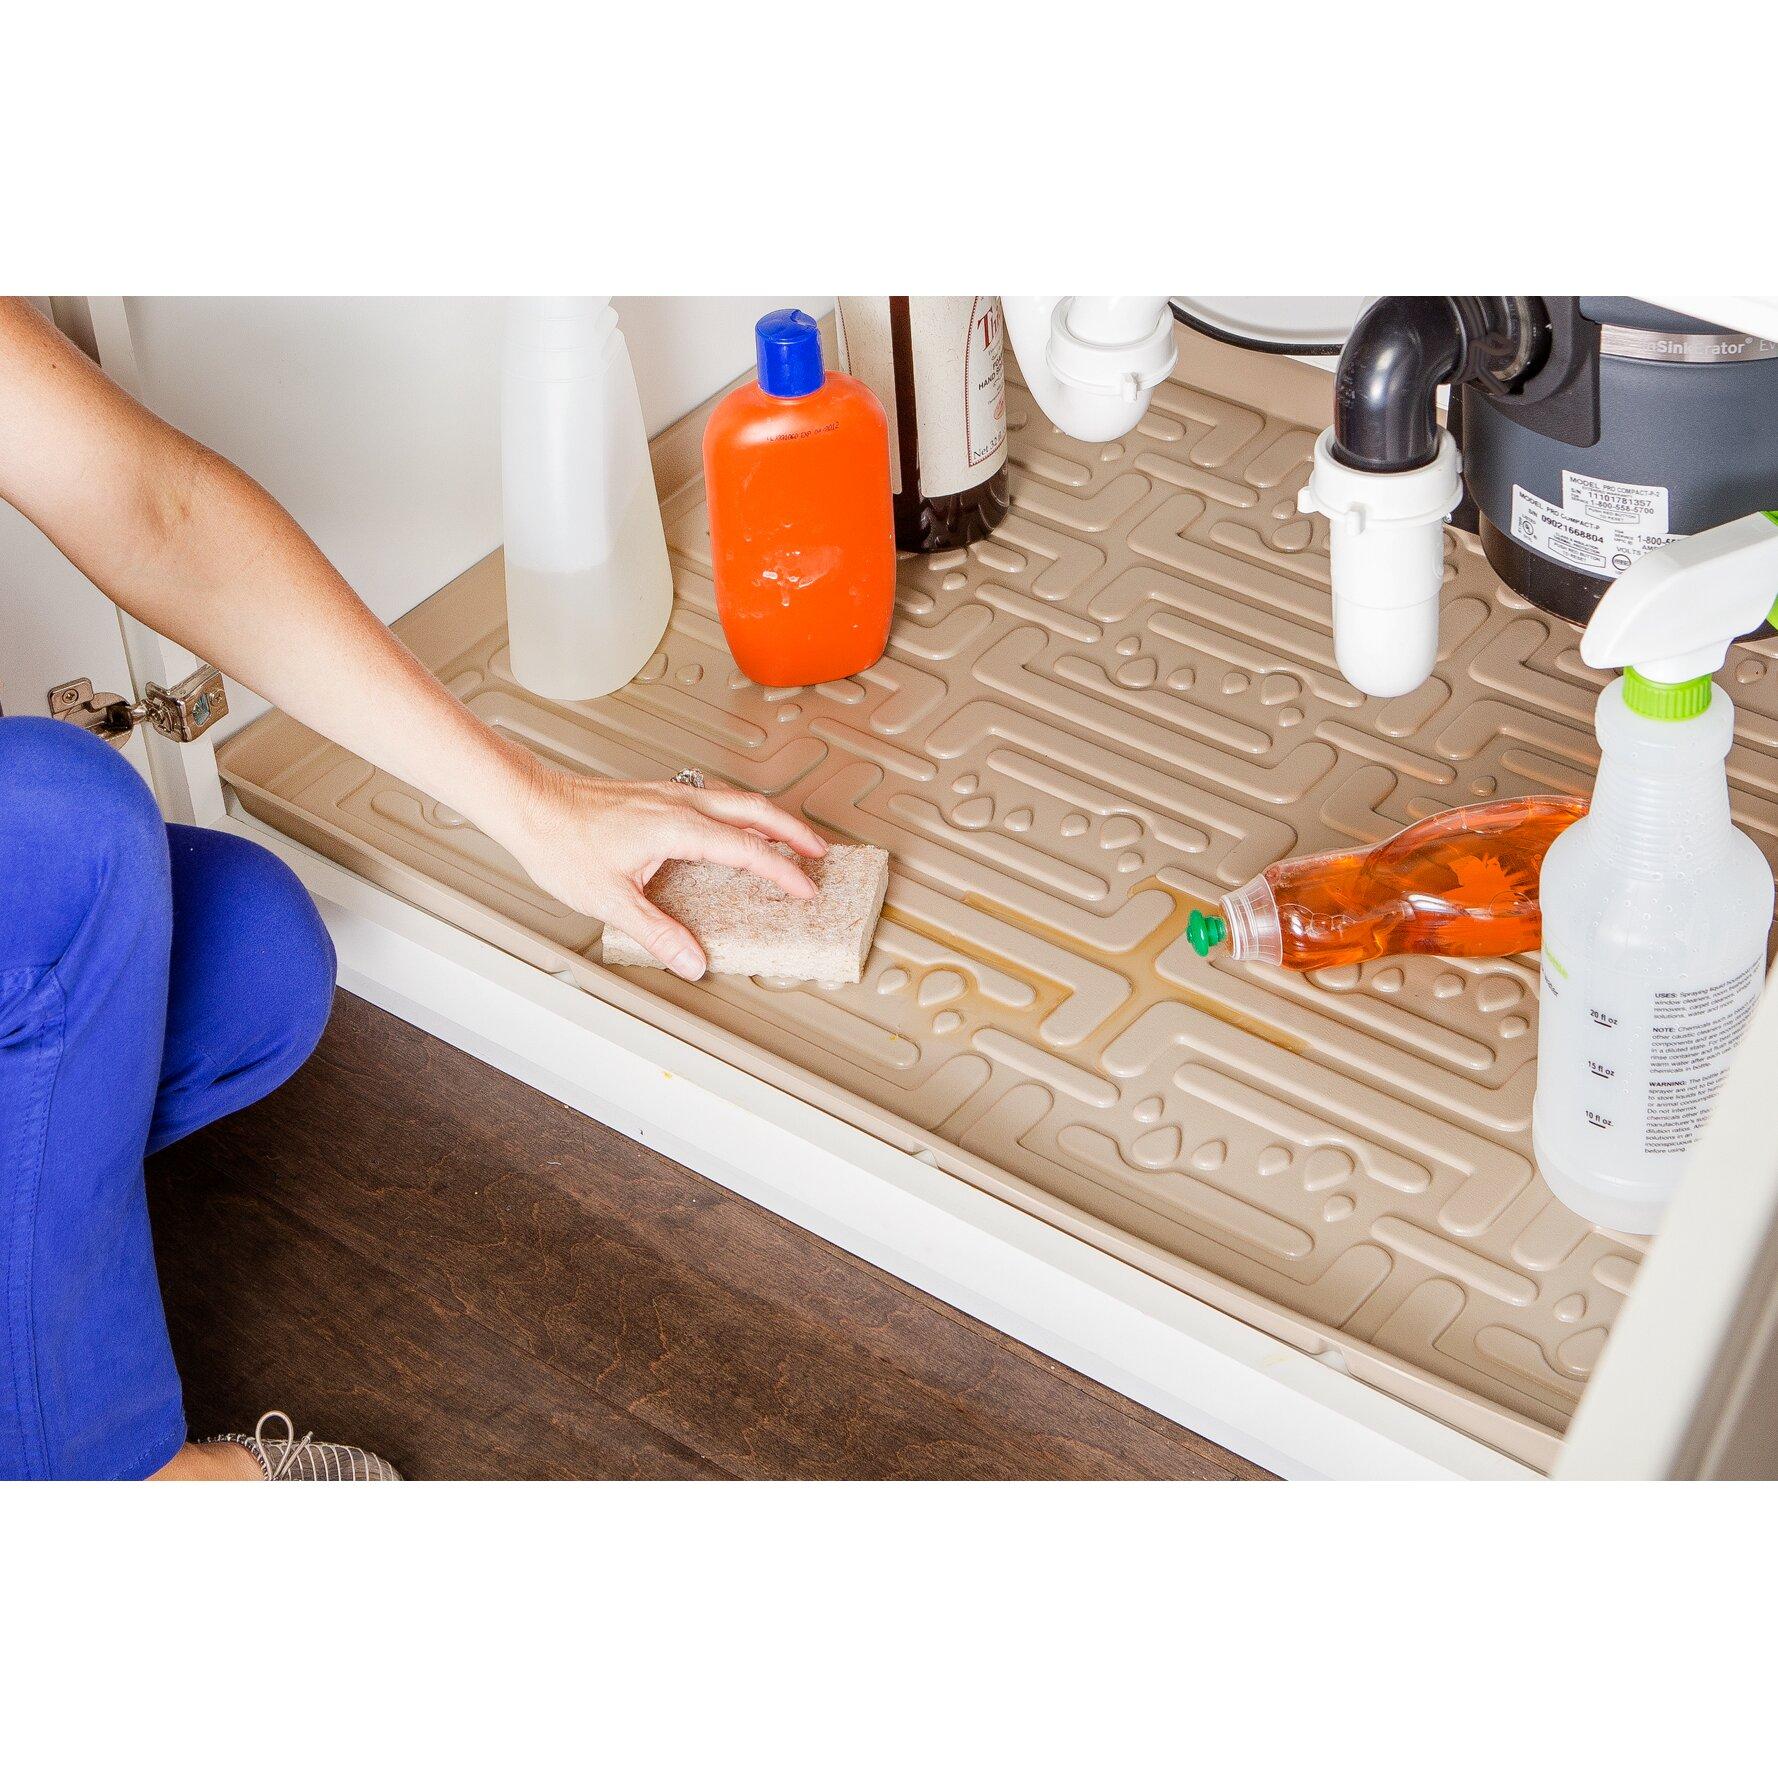 Xtreme Mats Under Sink Kitchen Drip Tray & Reviews